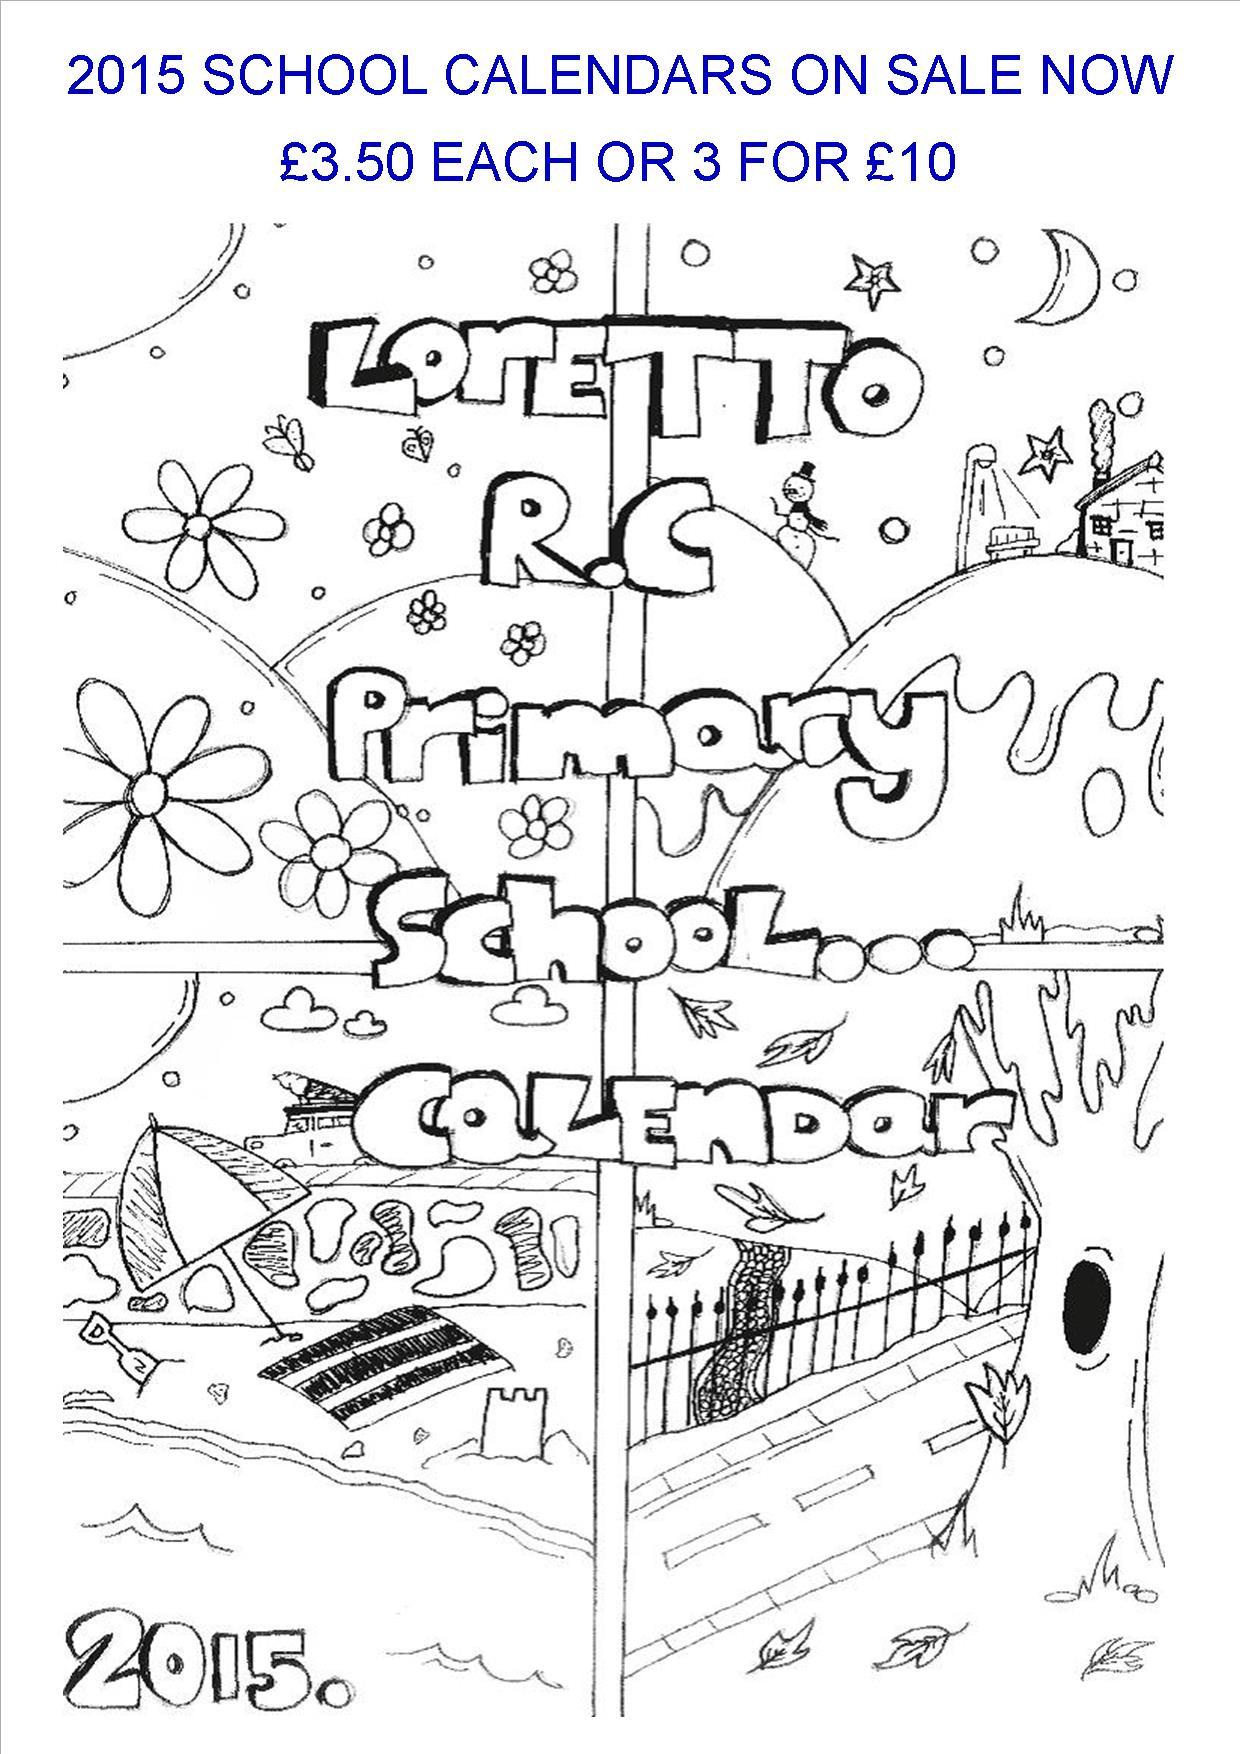 2015 School Calendar Poster